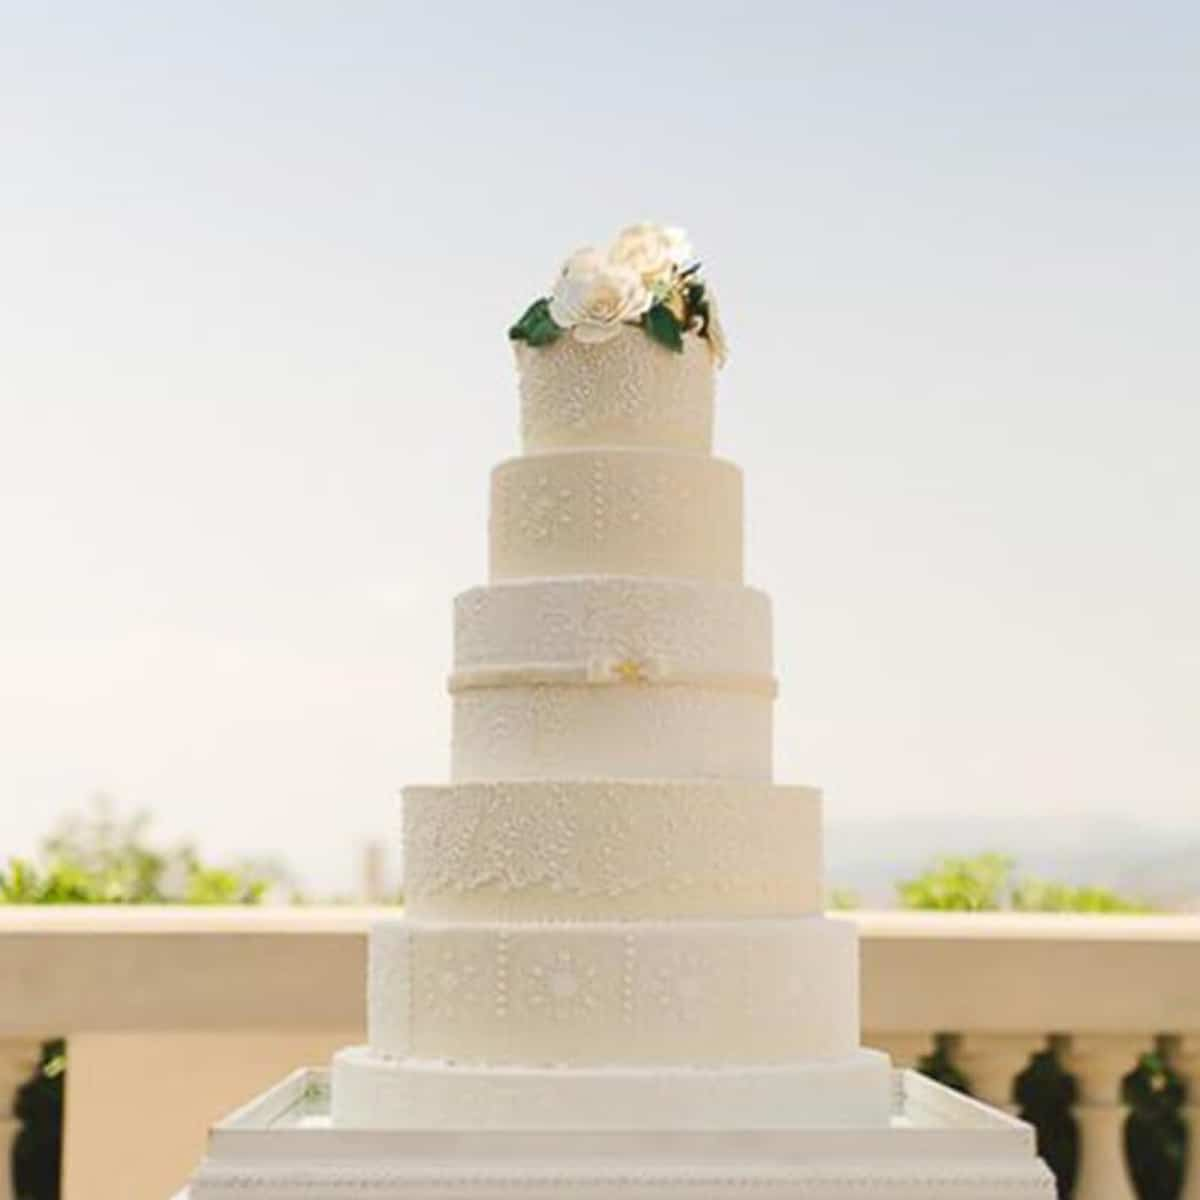 Fullsize Of Italian Wedding Cake